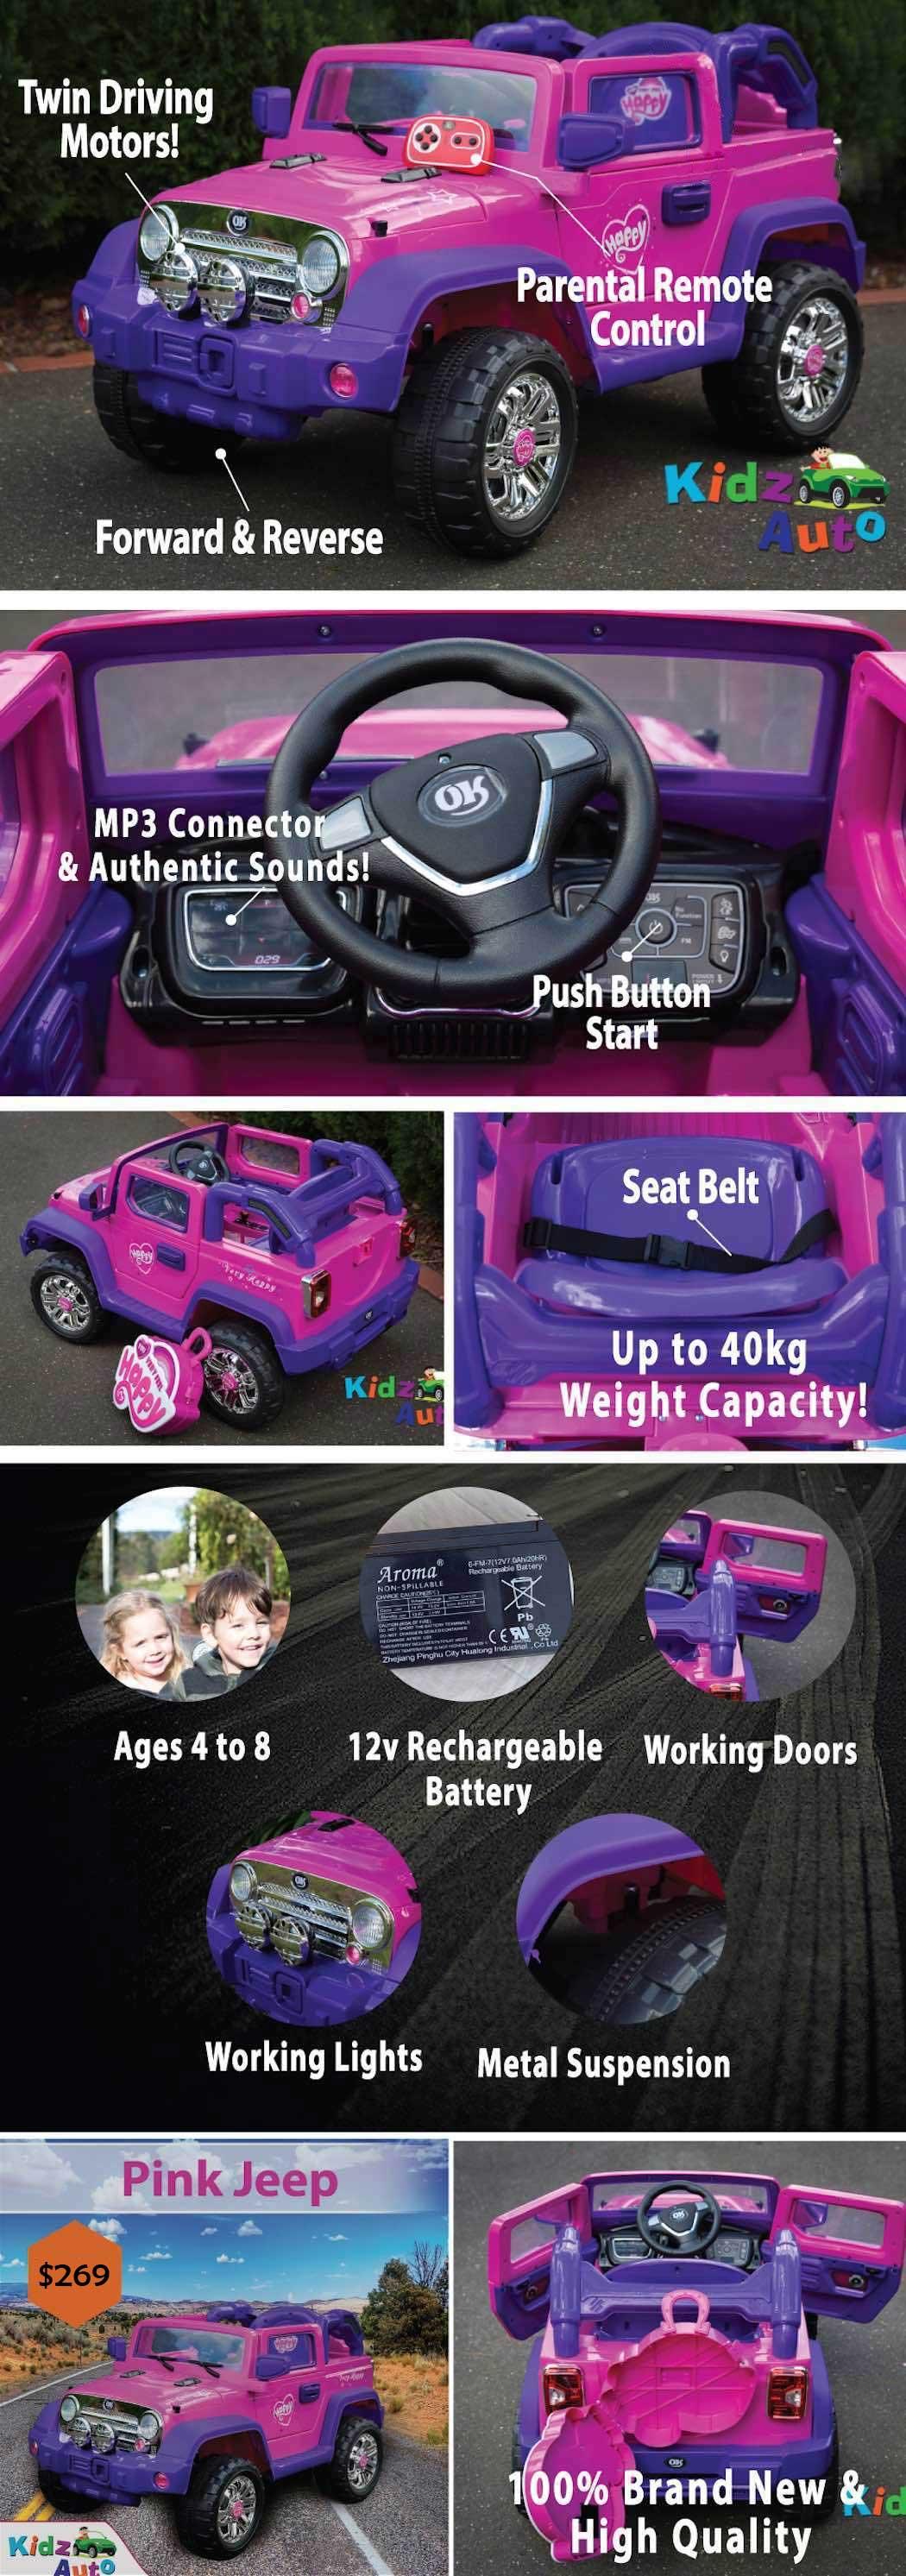 Kidz Auto Ride on Cars